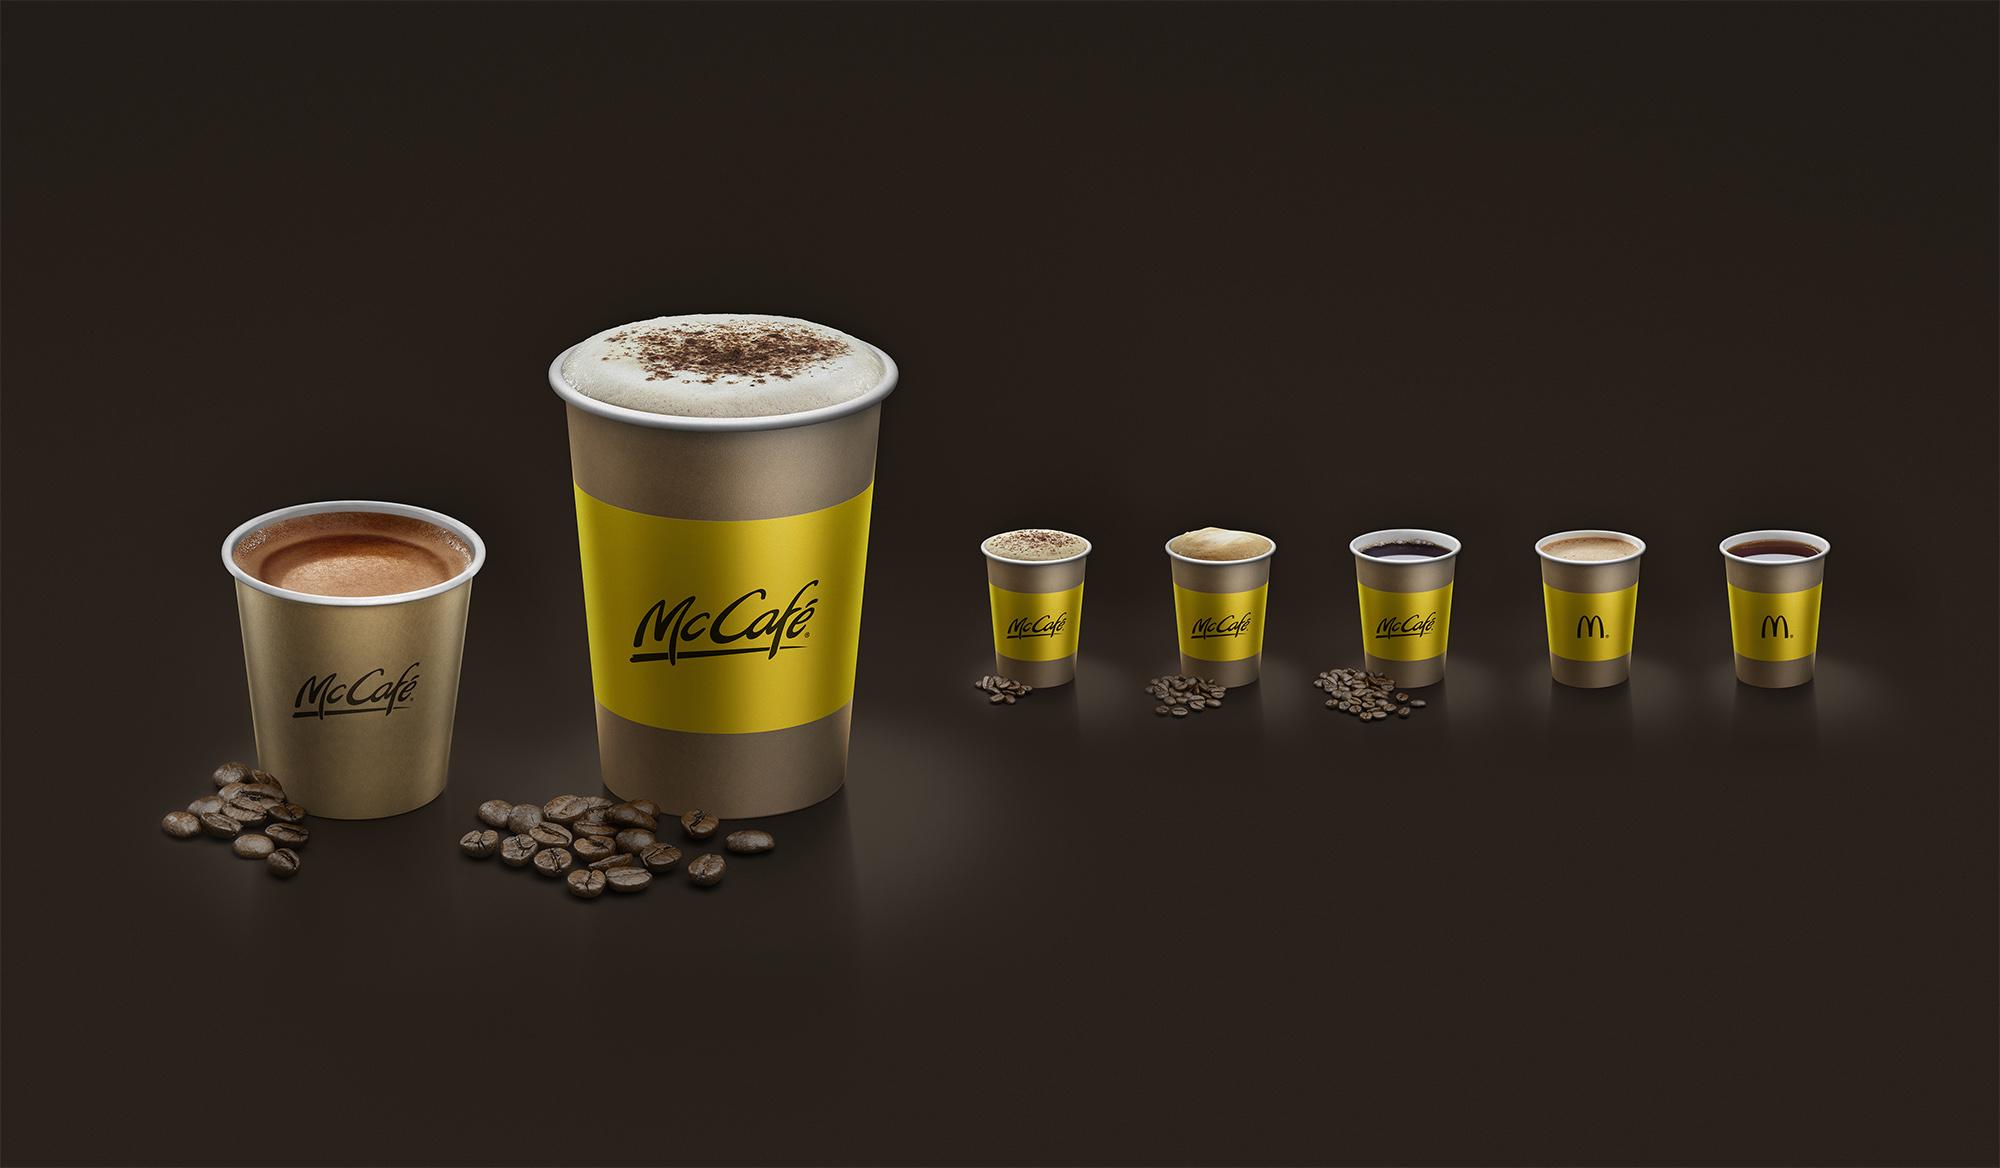 McDonalds Cafe Brown